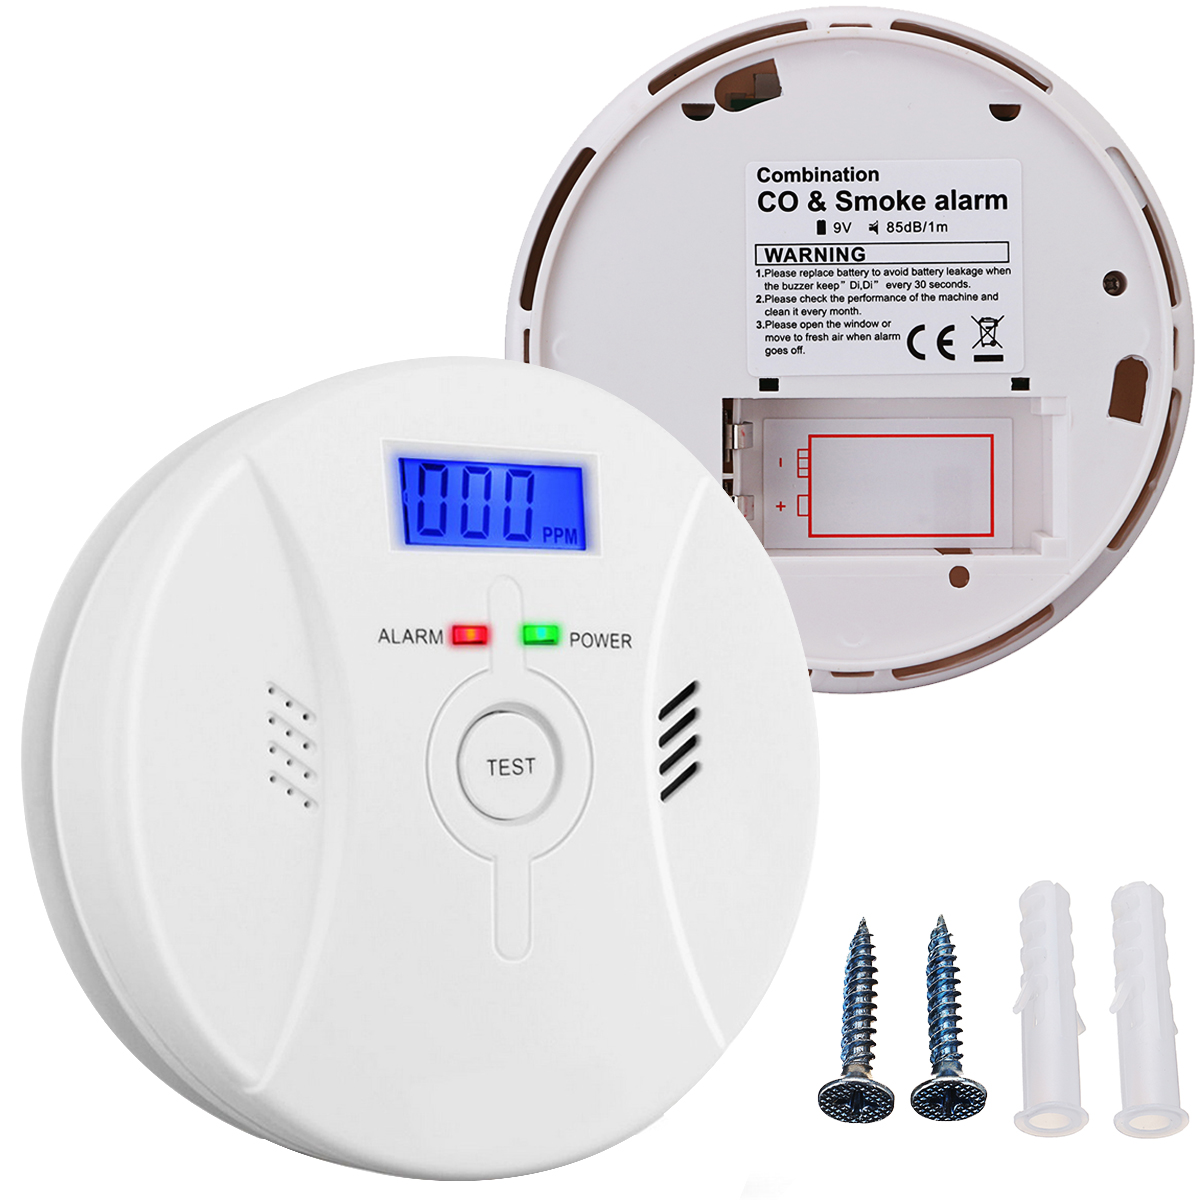 Arzil Combination Smoke & Carbon Monoxide Alarm Battery Operated Wireless Fire Sensor  CO Detector Voice & Flash Alarm Electrochemical Sensor with CO Level Digital Display